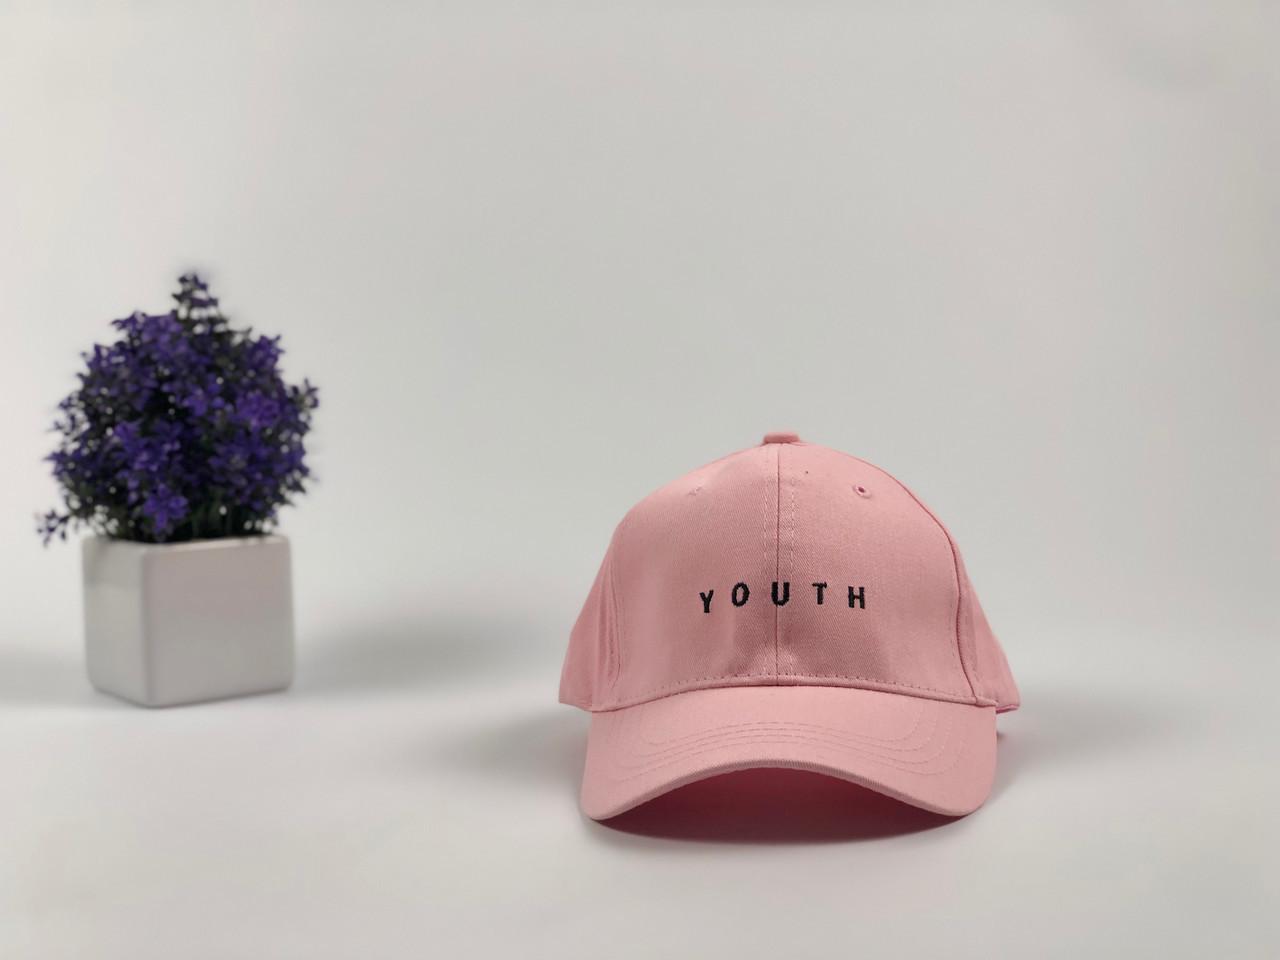 Кепка бейсболка Youth (розовая) застежка пластик